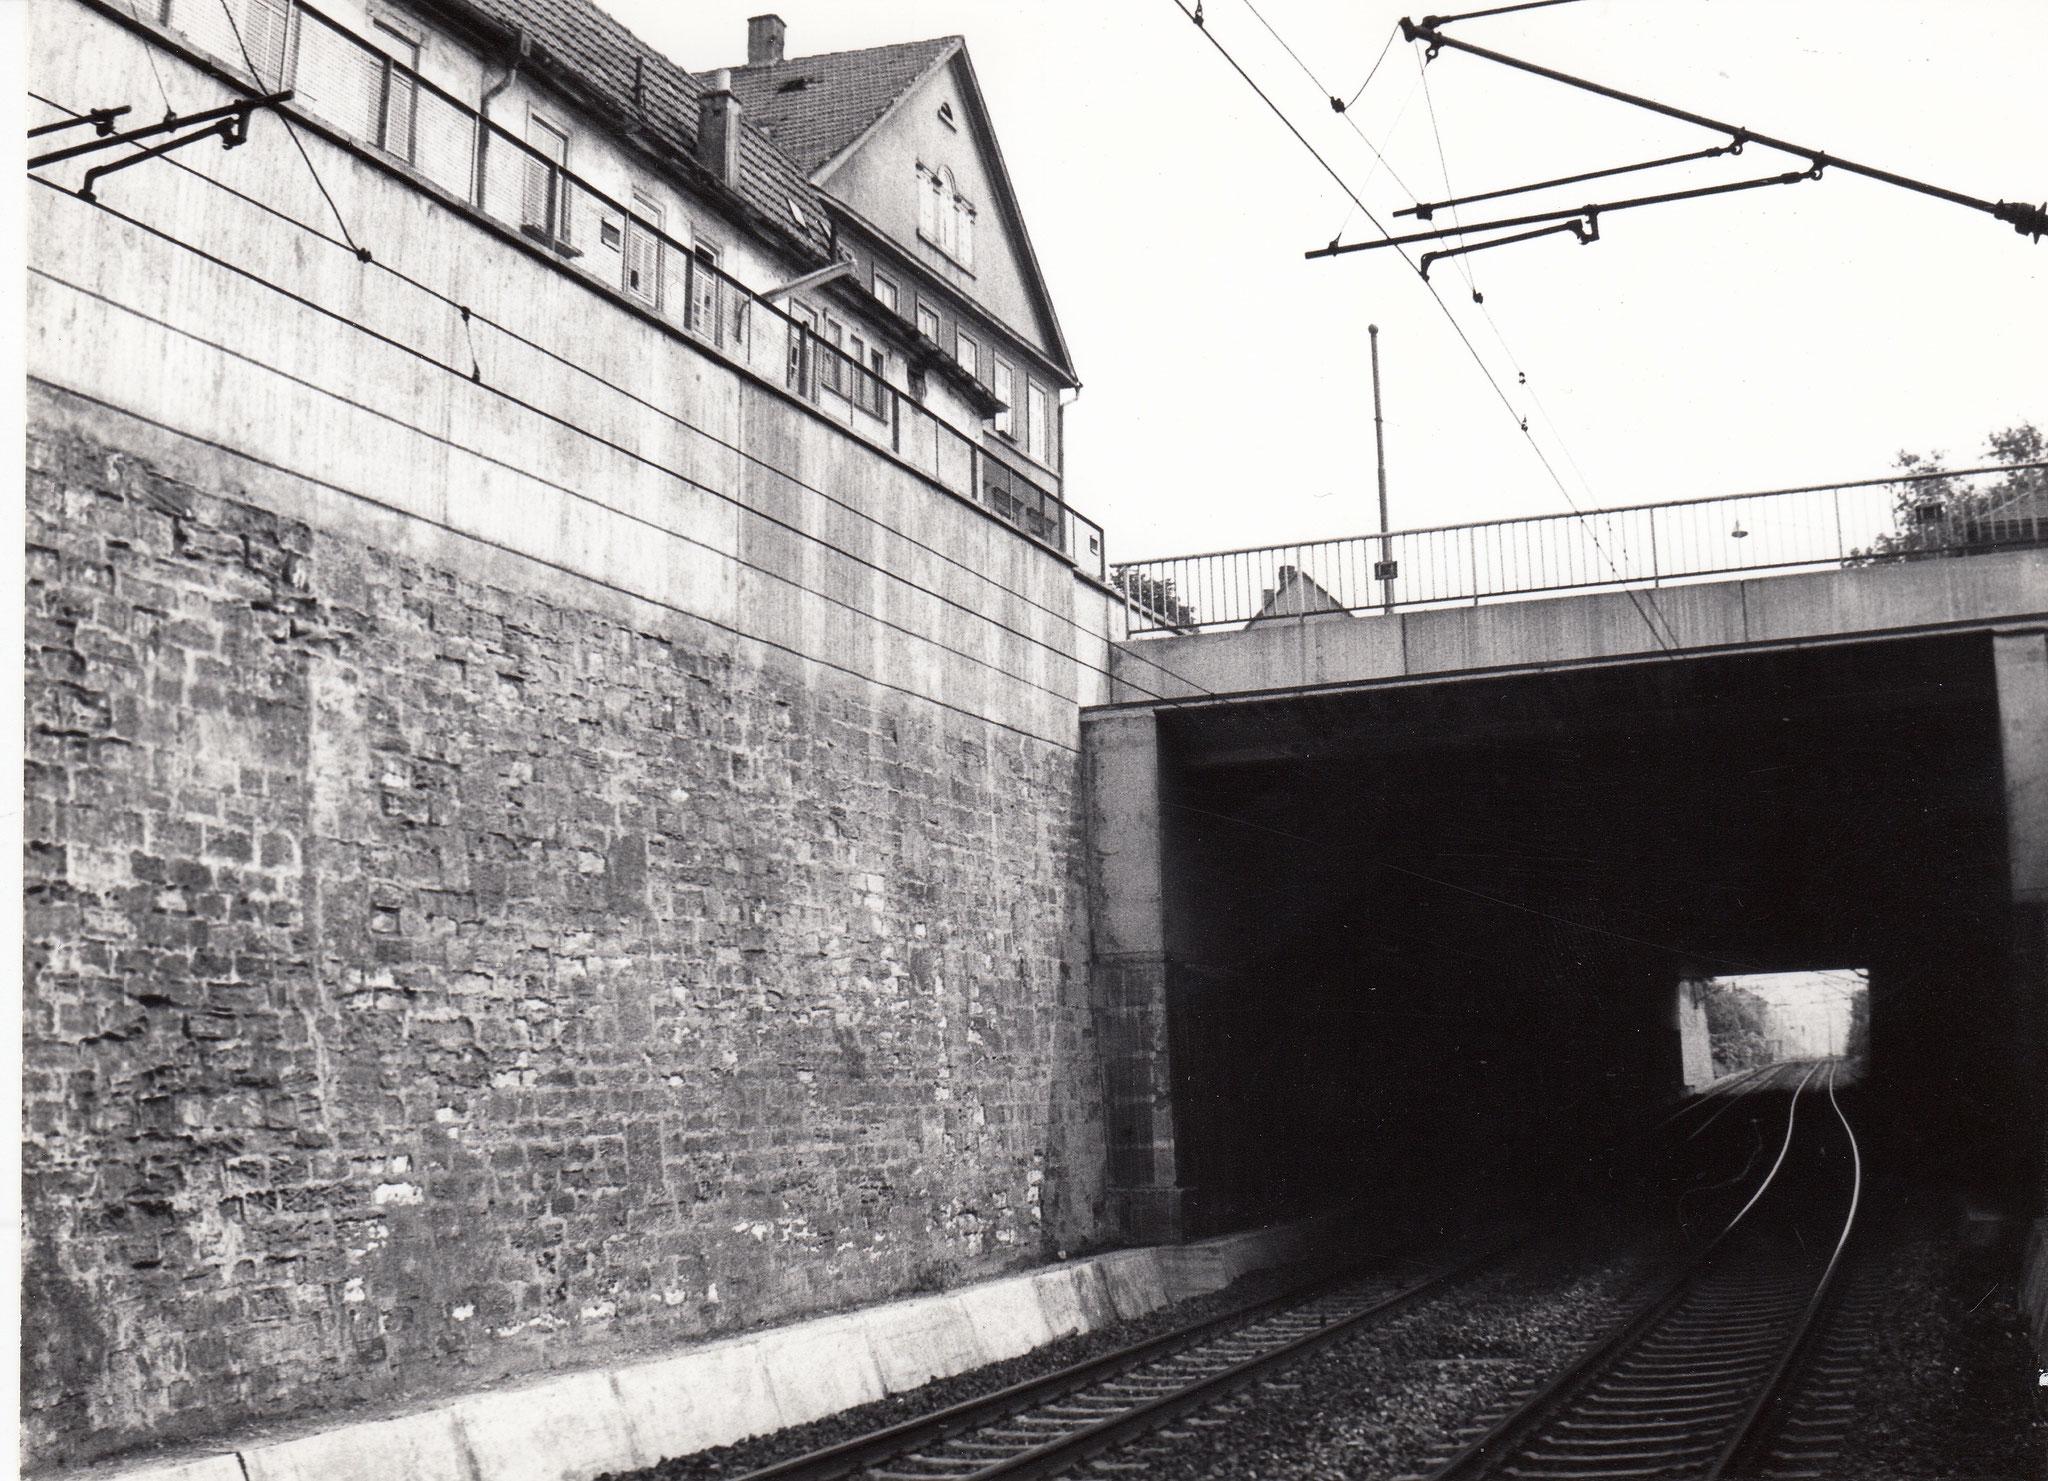 Bahngleise unter Brückenstraße mit Giebel des Sennfelder Hofes, Brückenstraße 32